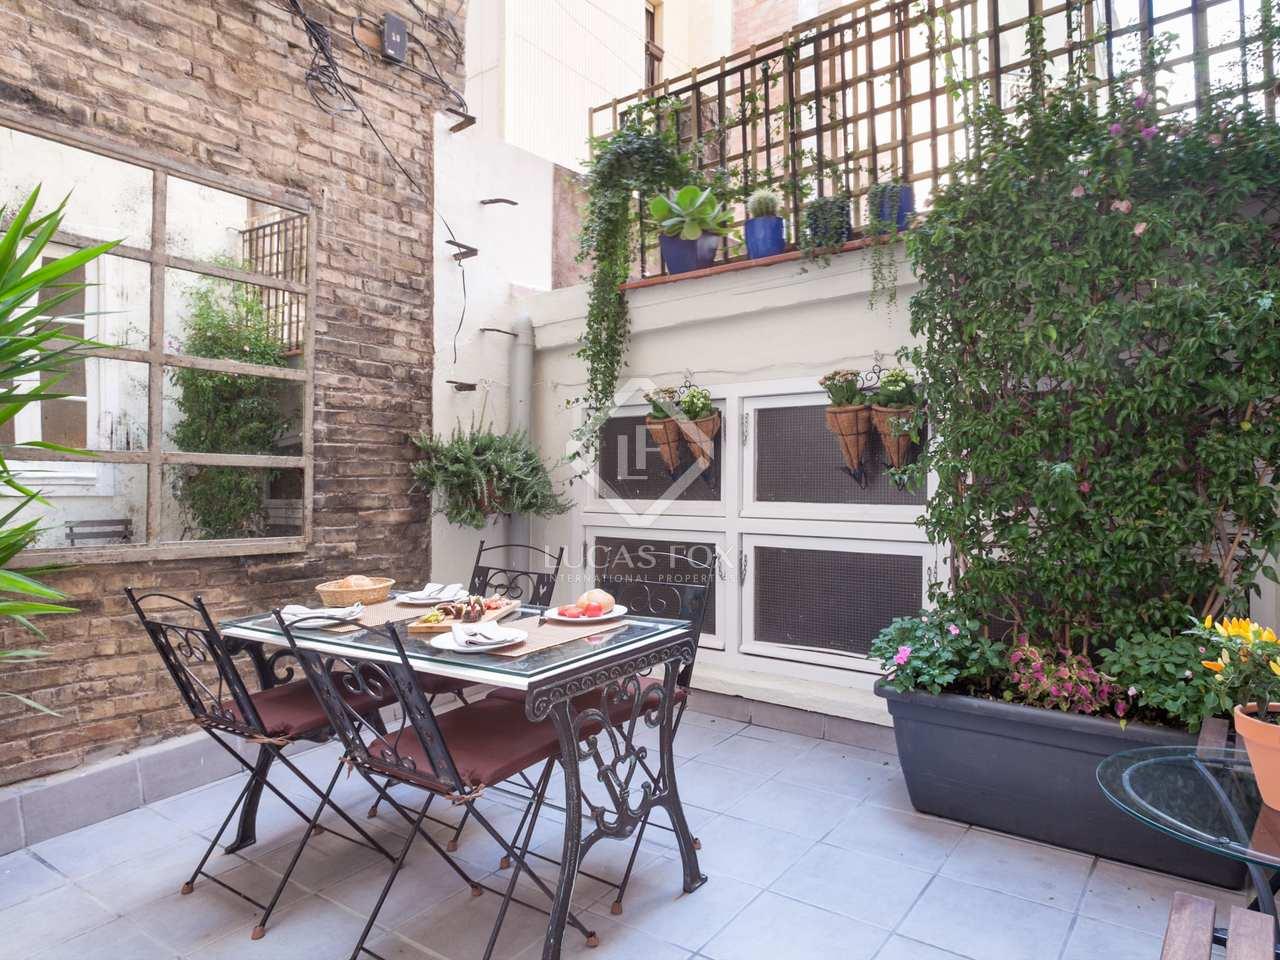 Apartamento con licencia tur stica en venta sagrada familia for Licencia apartamento turistico madrid